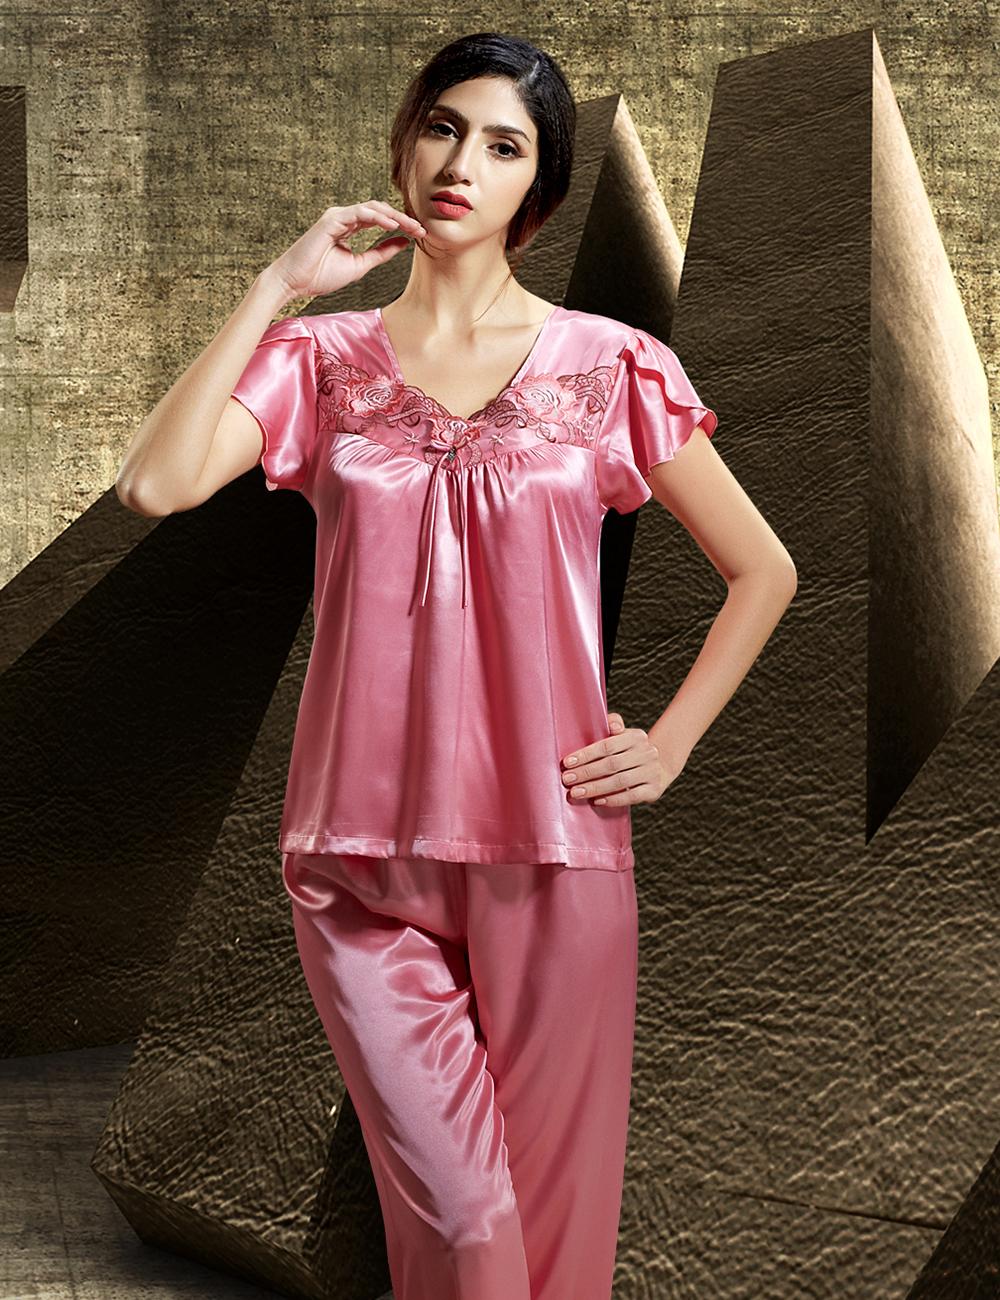 2016 Summer Women Pajamas Ruffles Short Sleeve Pijama Emulation Silk Sexy Square Collar Sleepwear Lace Embroidery Pyjama 6511(China (Mainland))